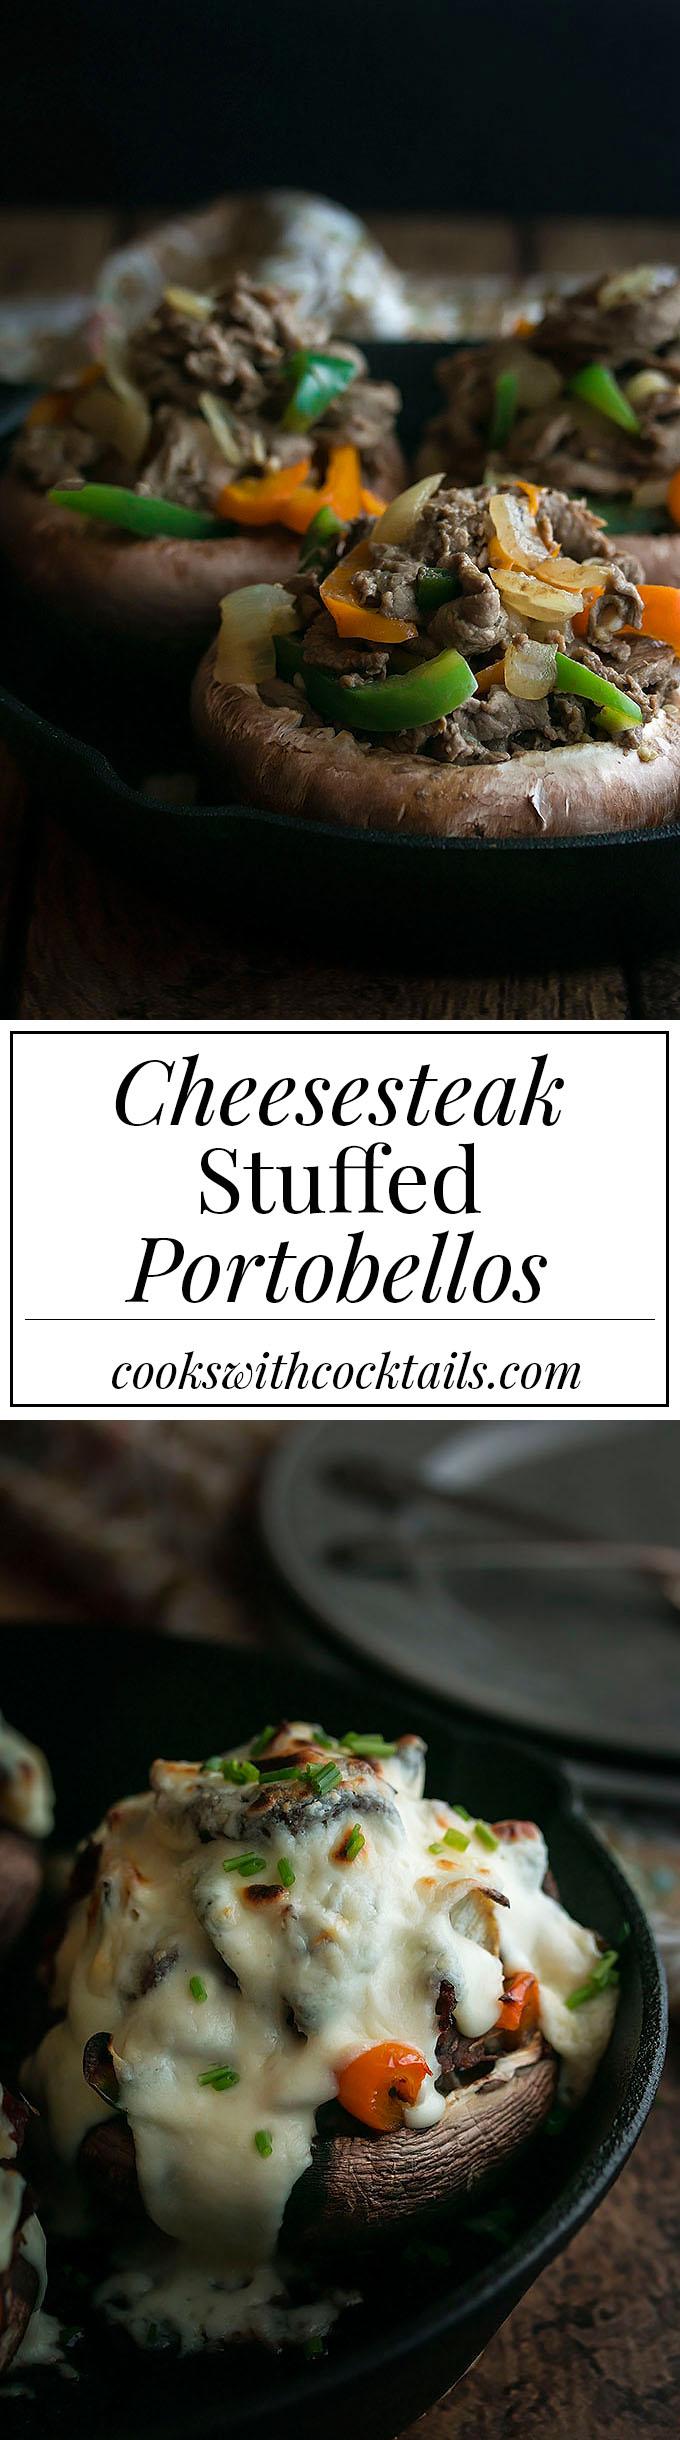 Cheesesteak Stuffed Portobellos